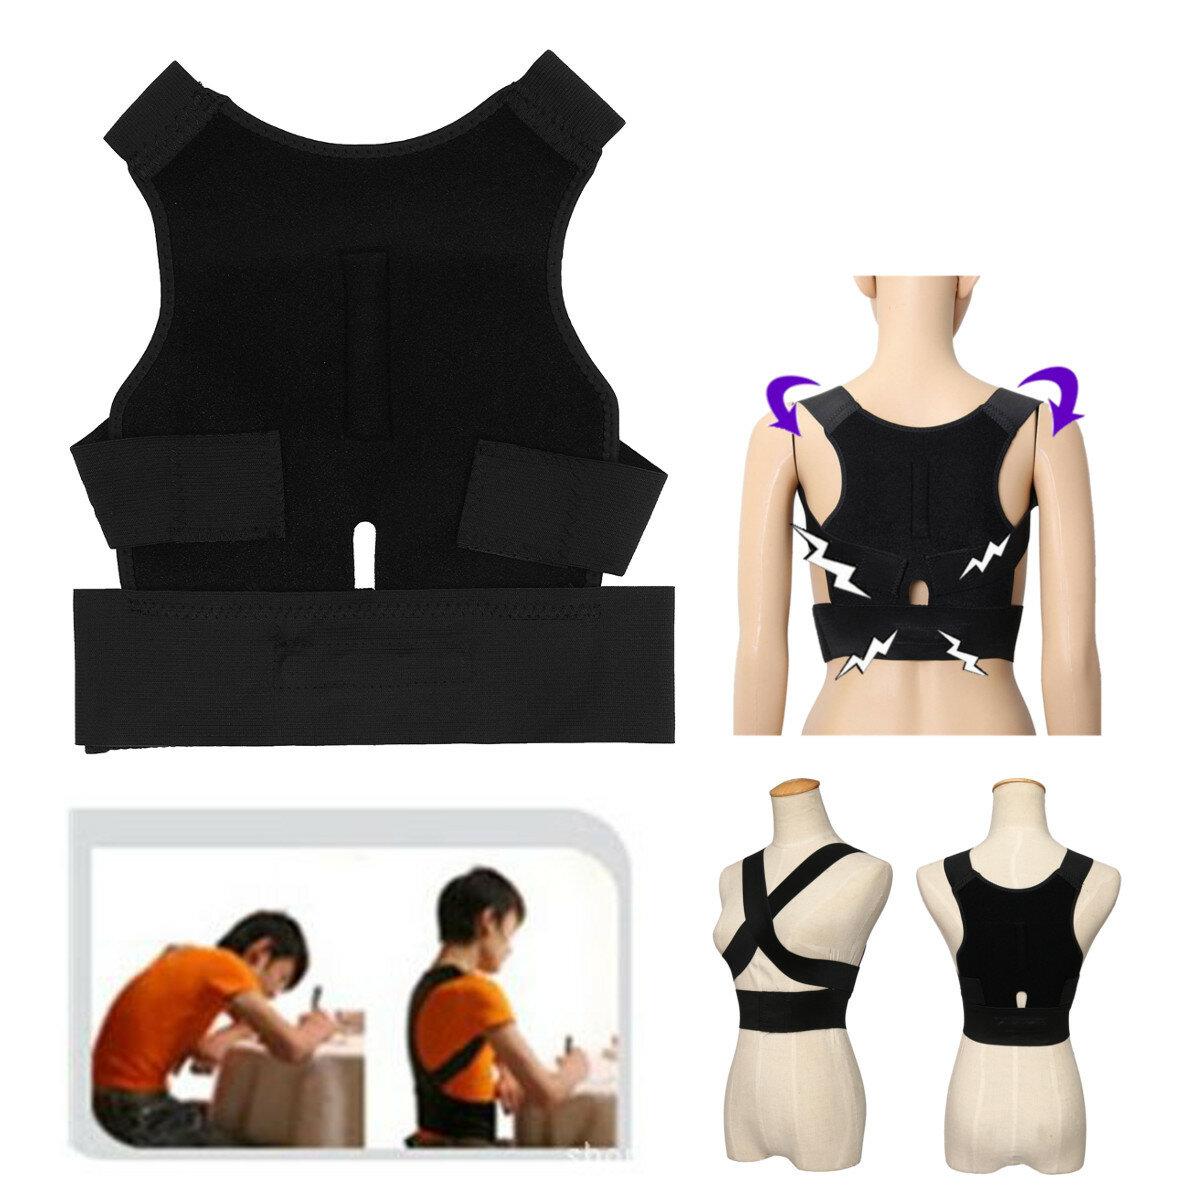 Back Humpback Corrector Shoulder Straight Support Brace Belt Therapy Men Women